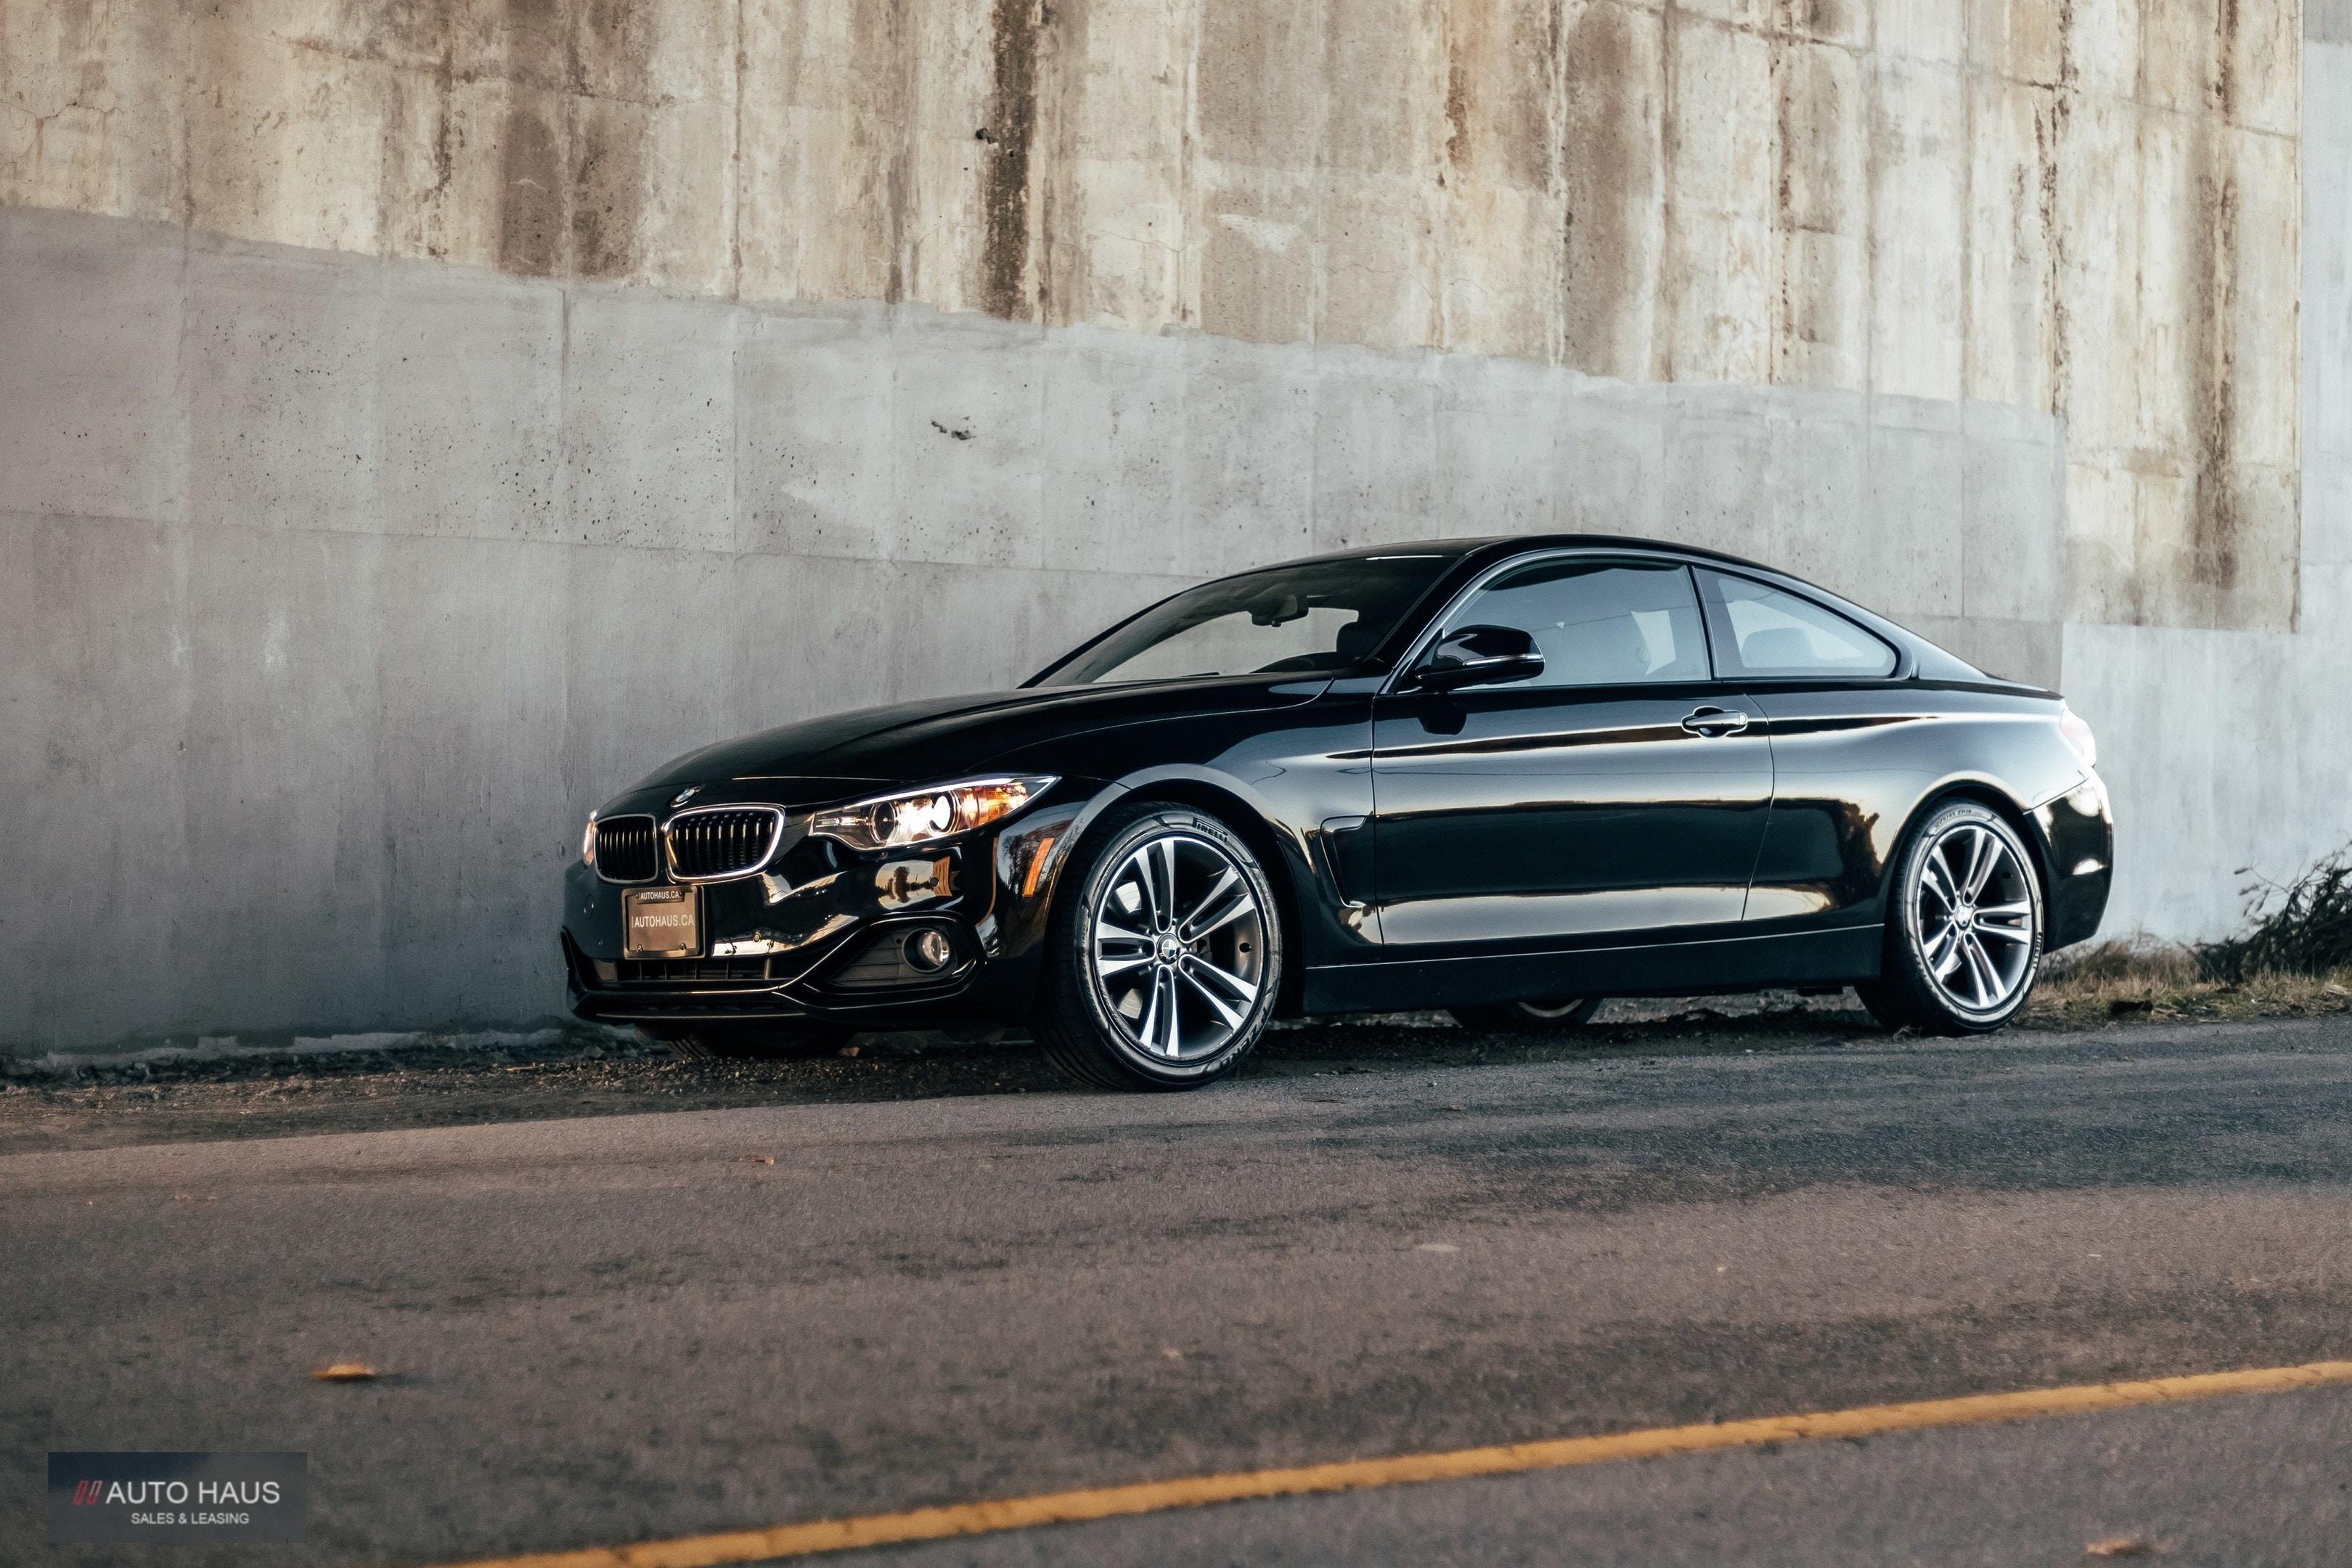 2014 BMW 428i NAV/SENSOR/LEATHER/ALLOYS/ALL POWER Coupe